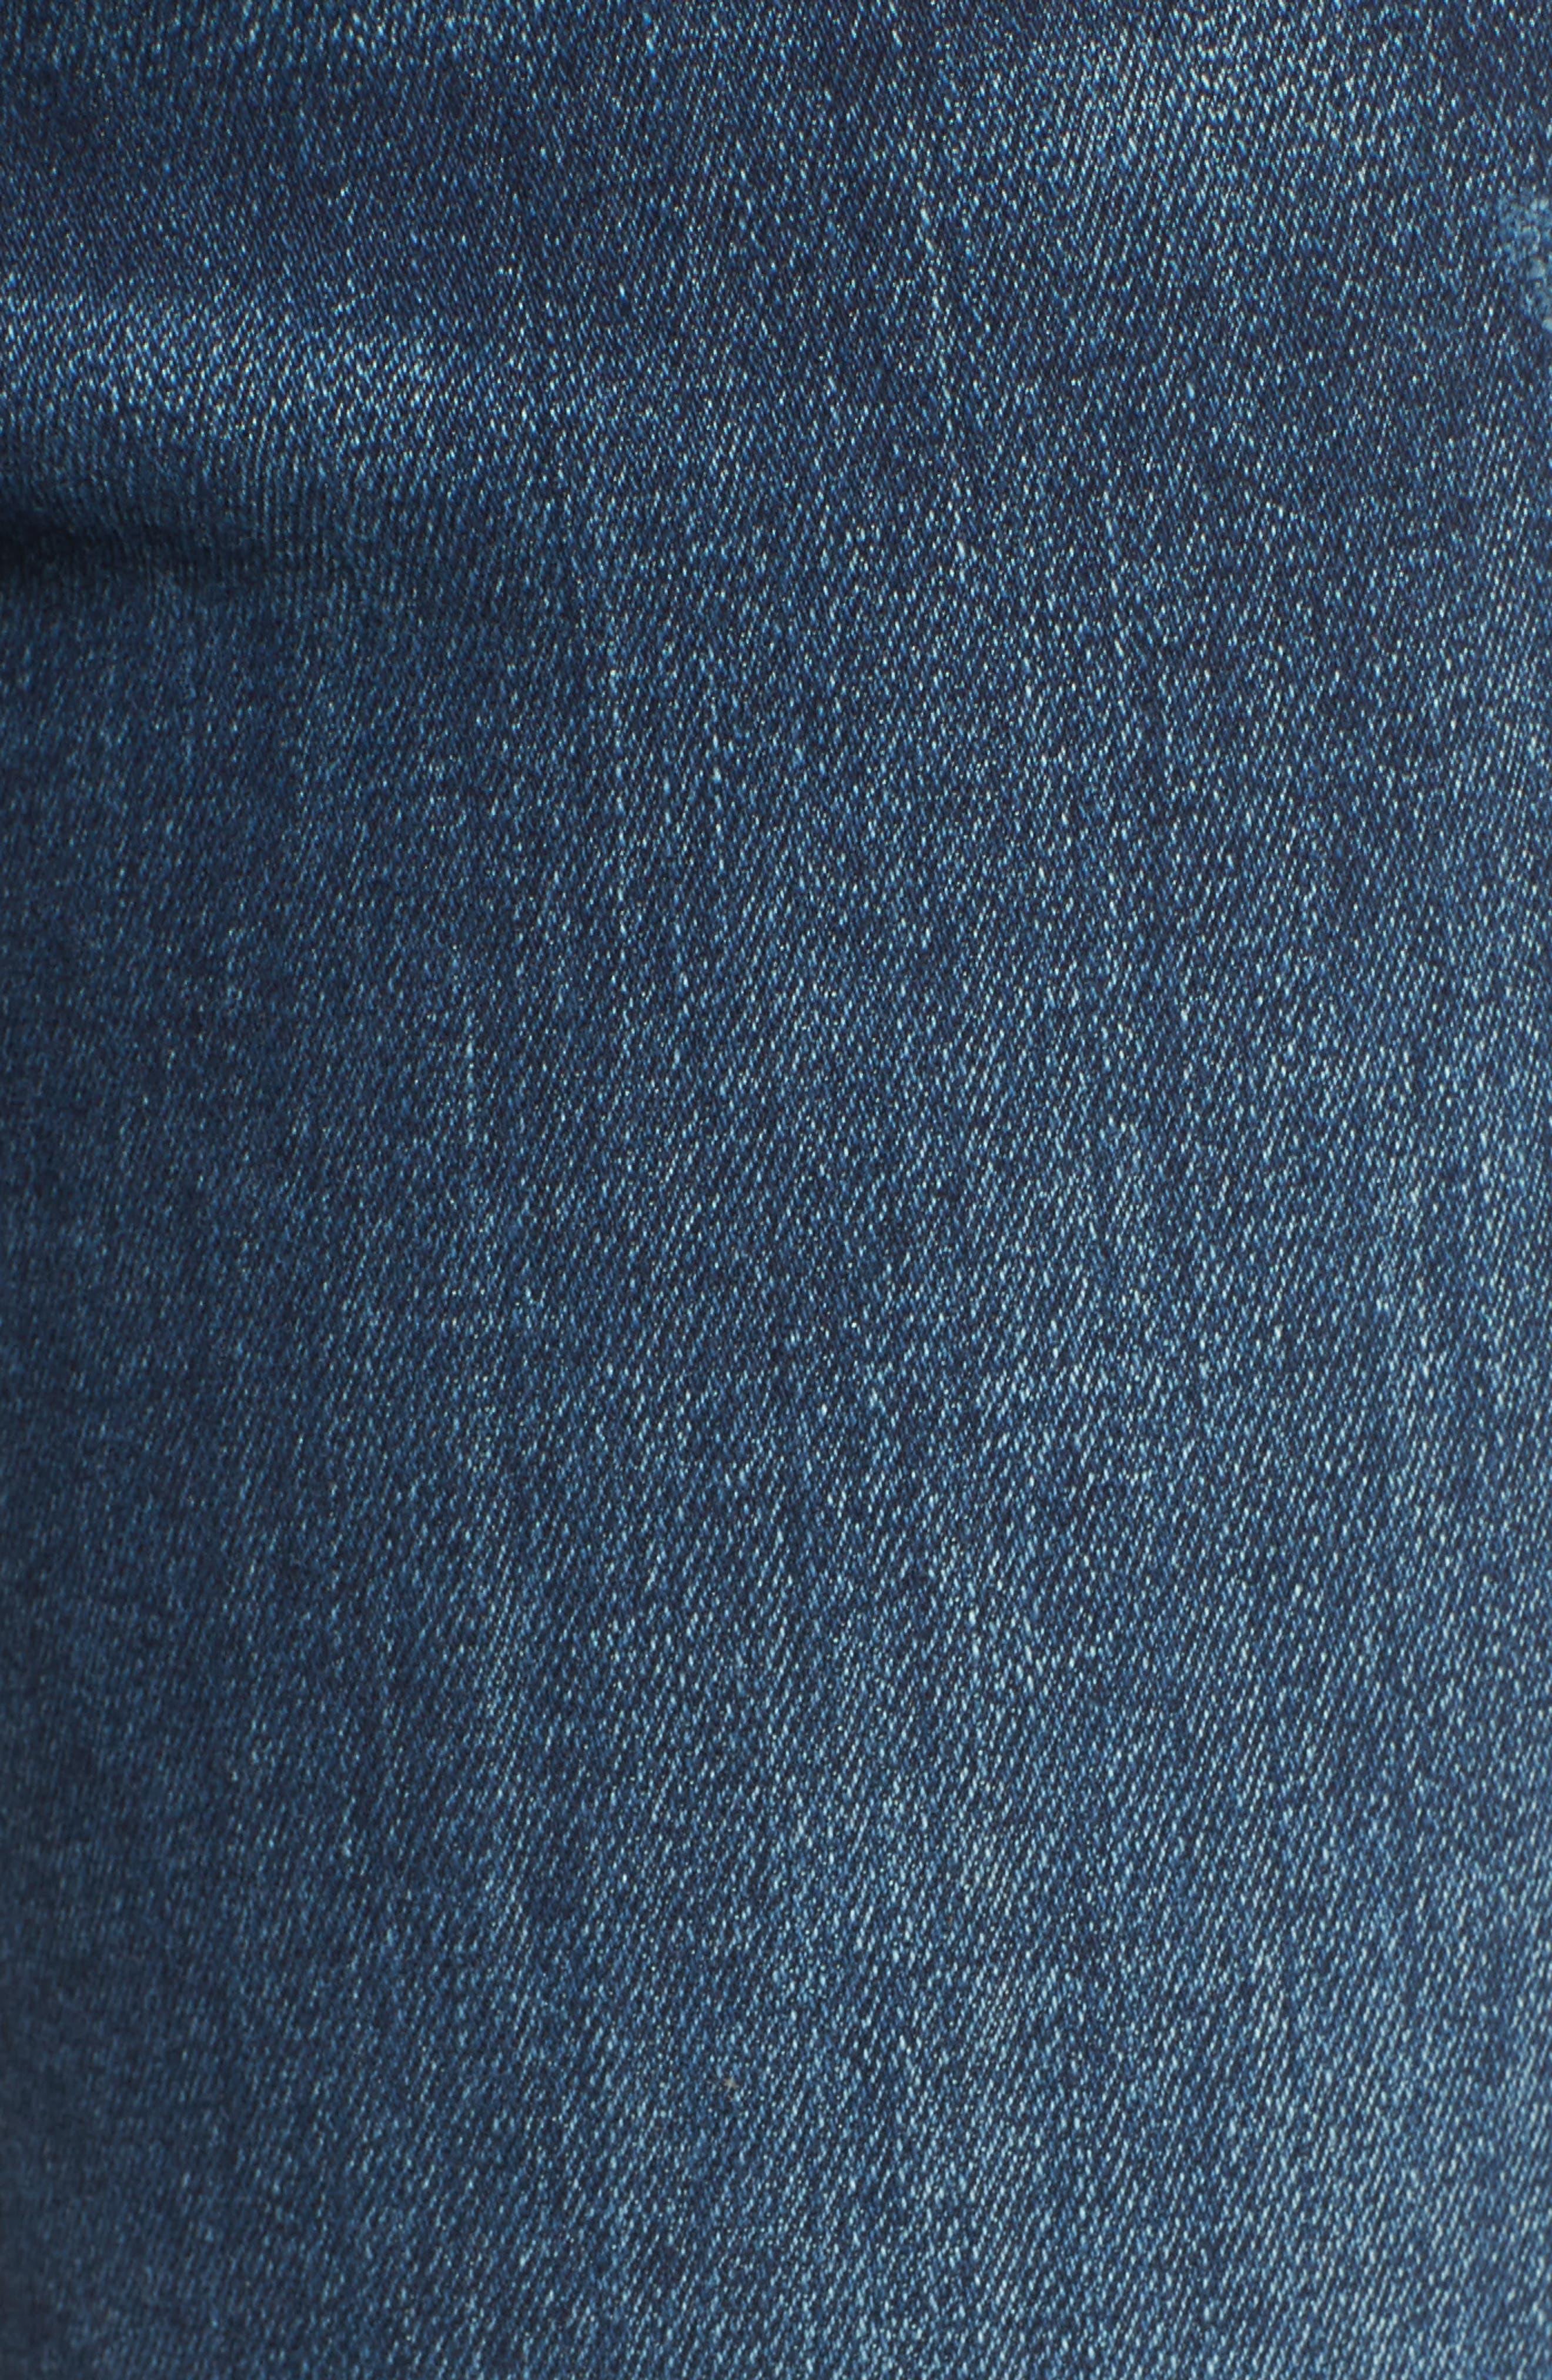 Mara Ankle Straight Leg Jeans,                             Alternate thumbnail 6, color,                             RAVINE